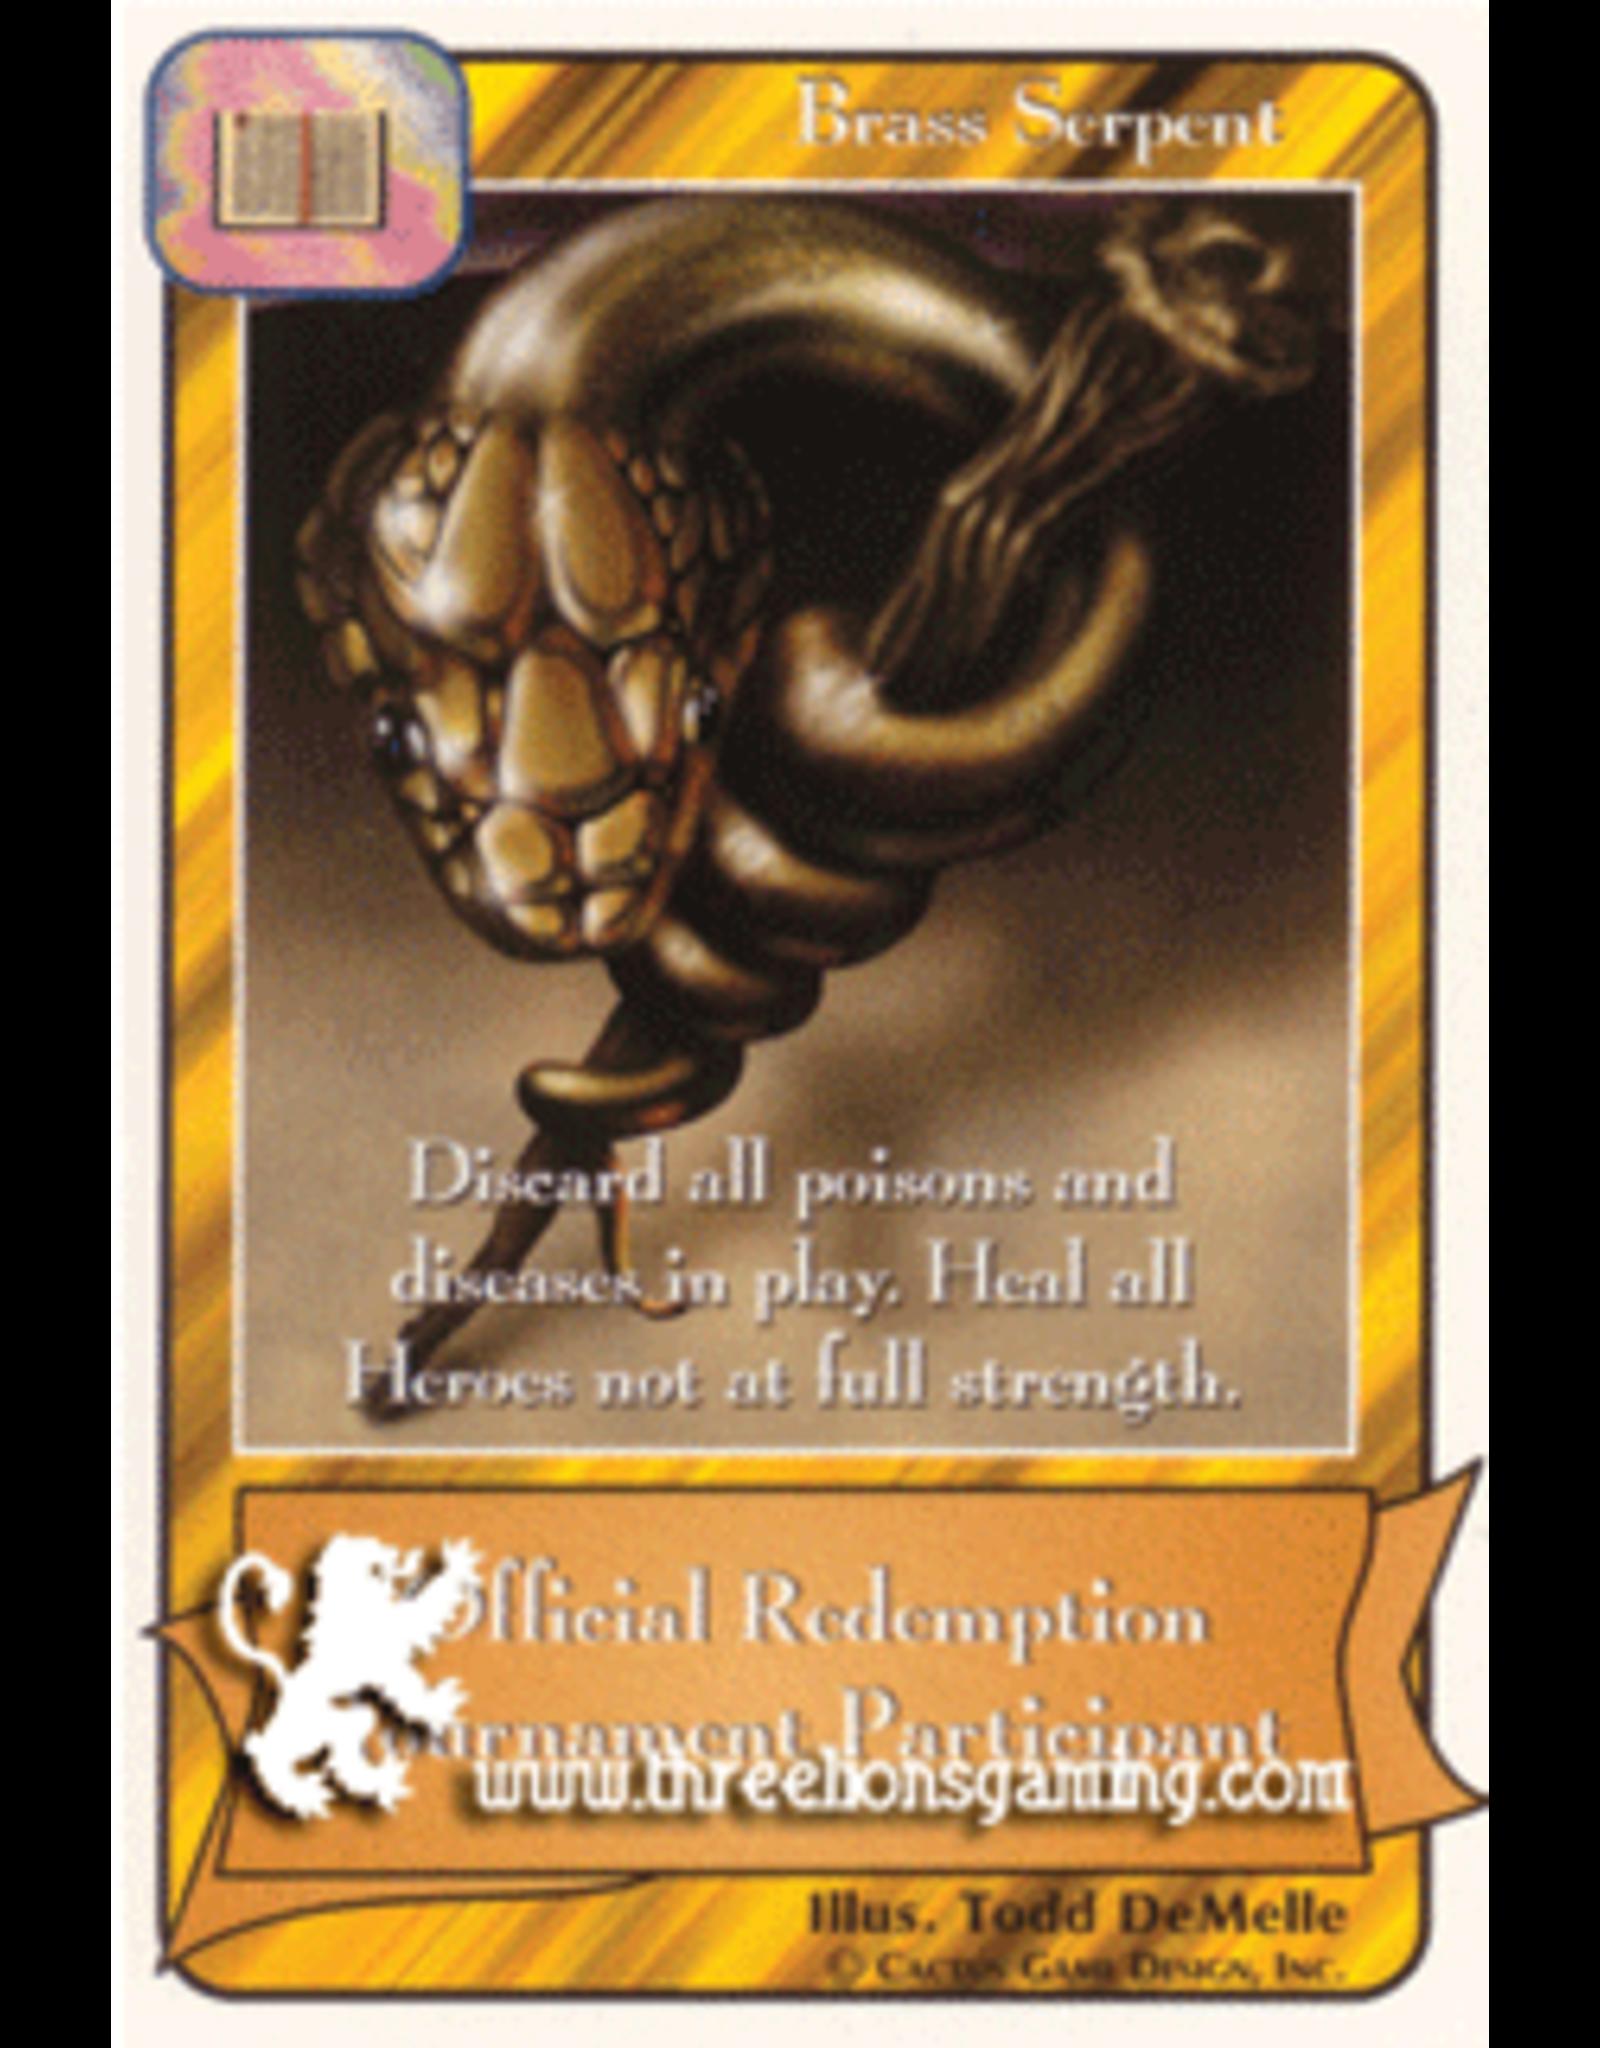 Promo: Brass Serpent